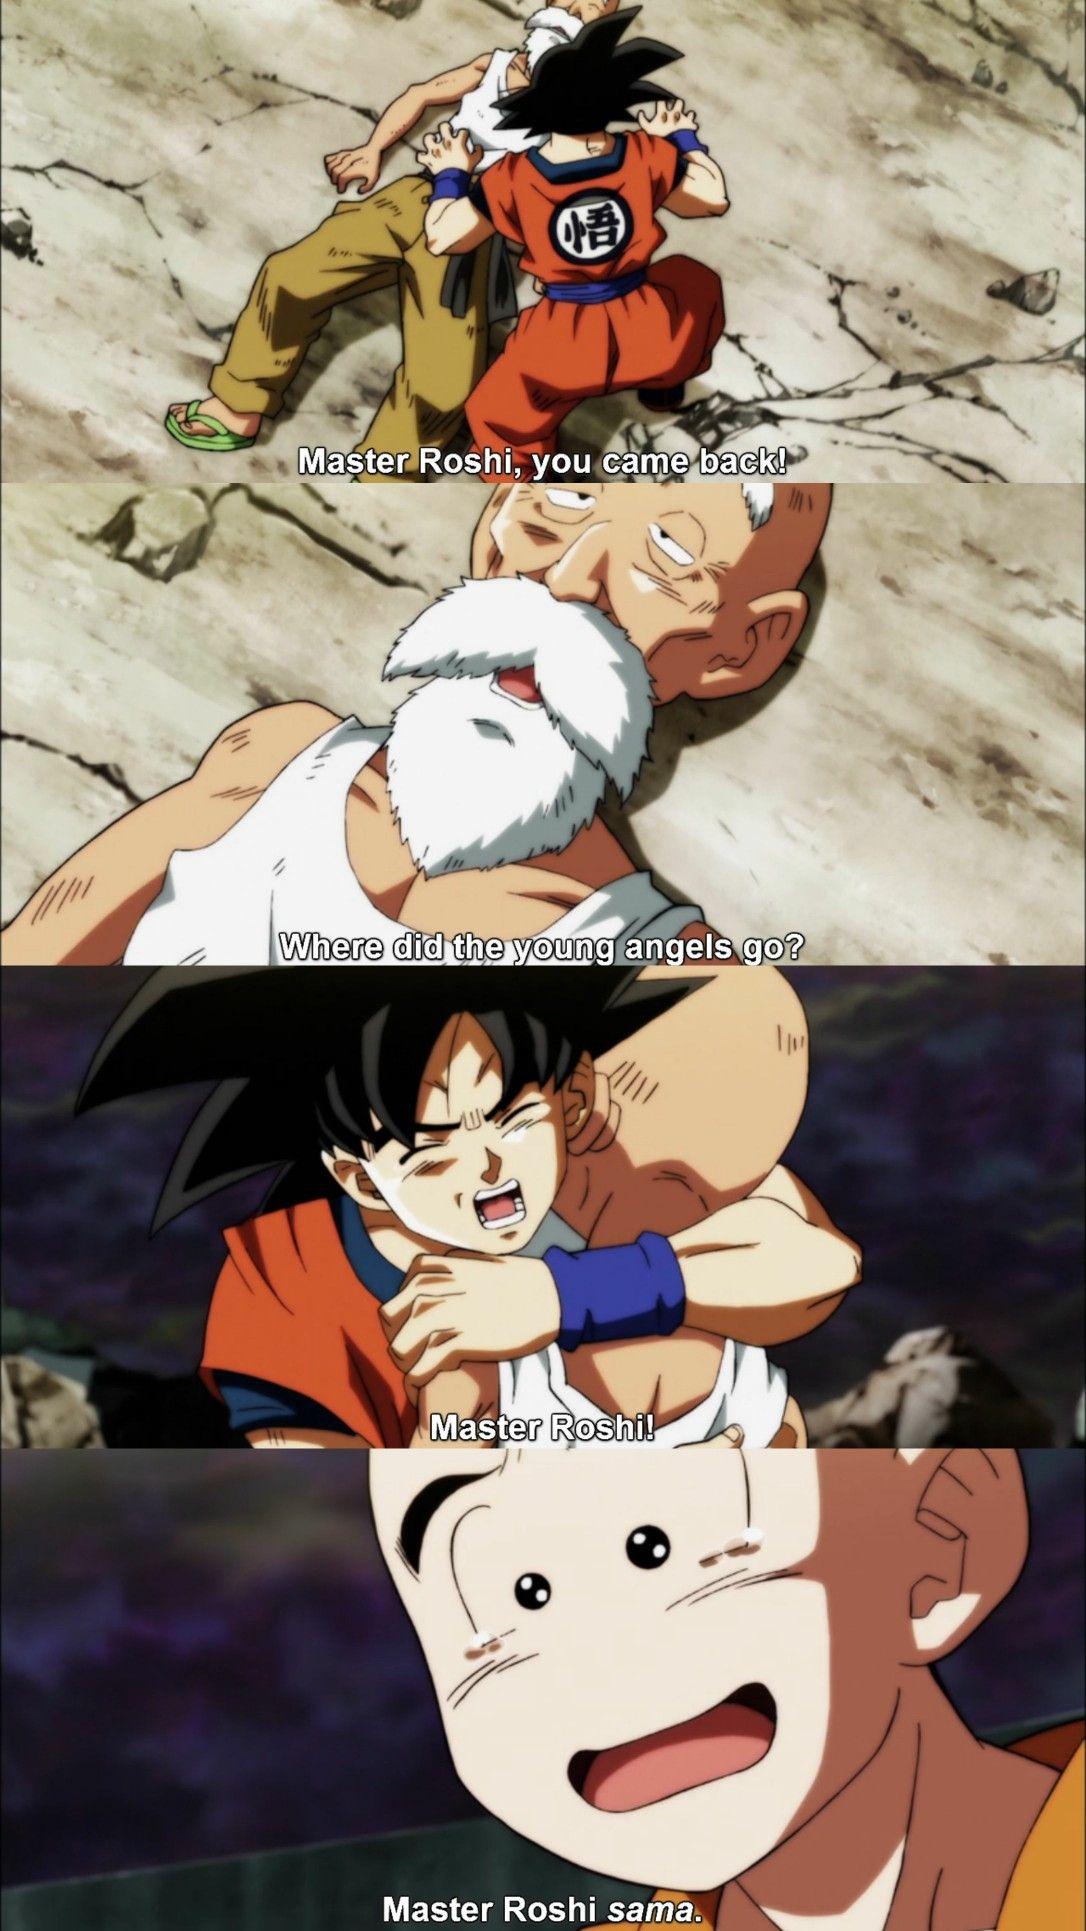 Goku Maestro Roshi Y Krillin Krillin Dragon Ball Z Anime